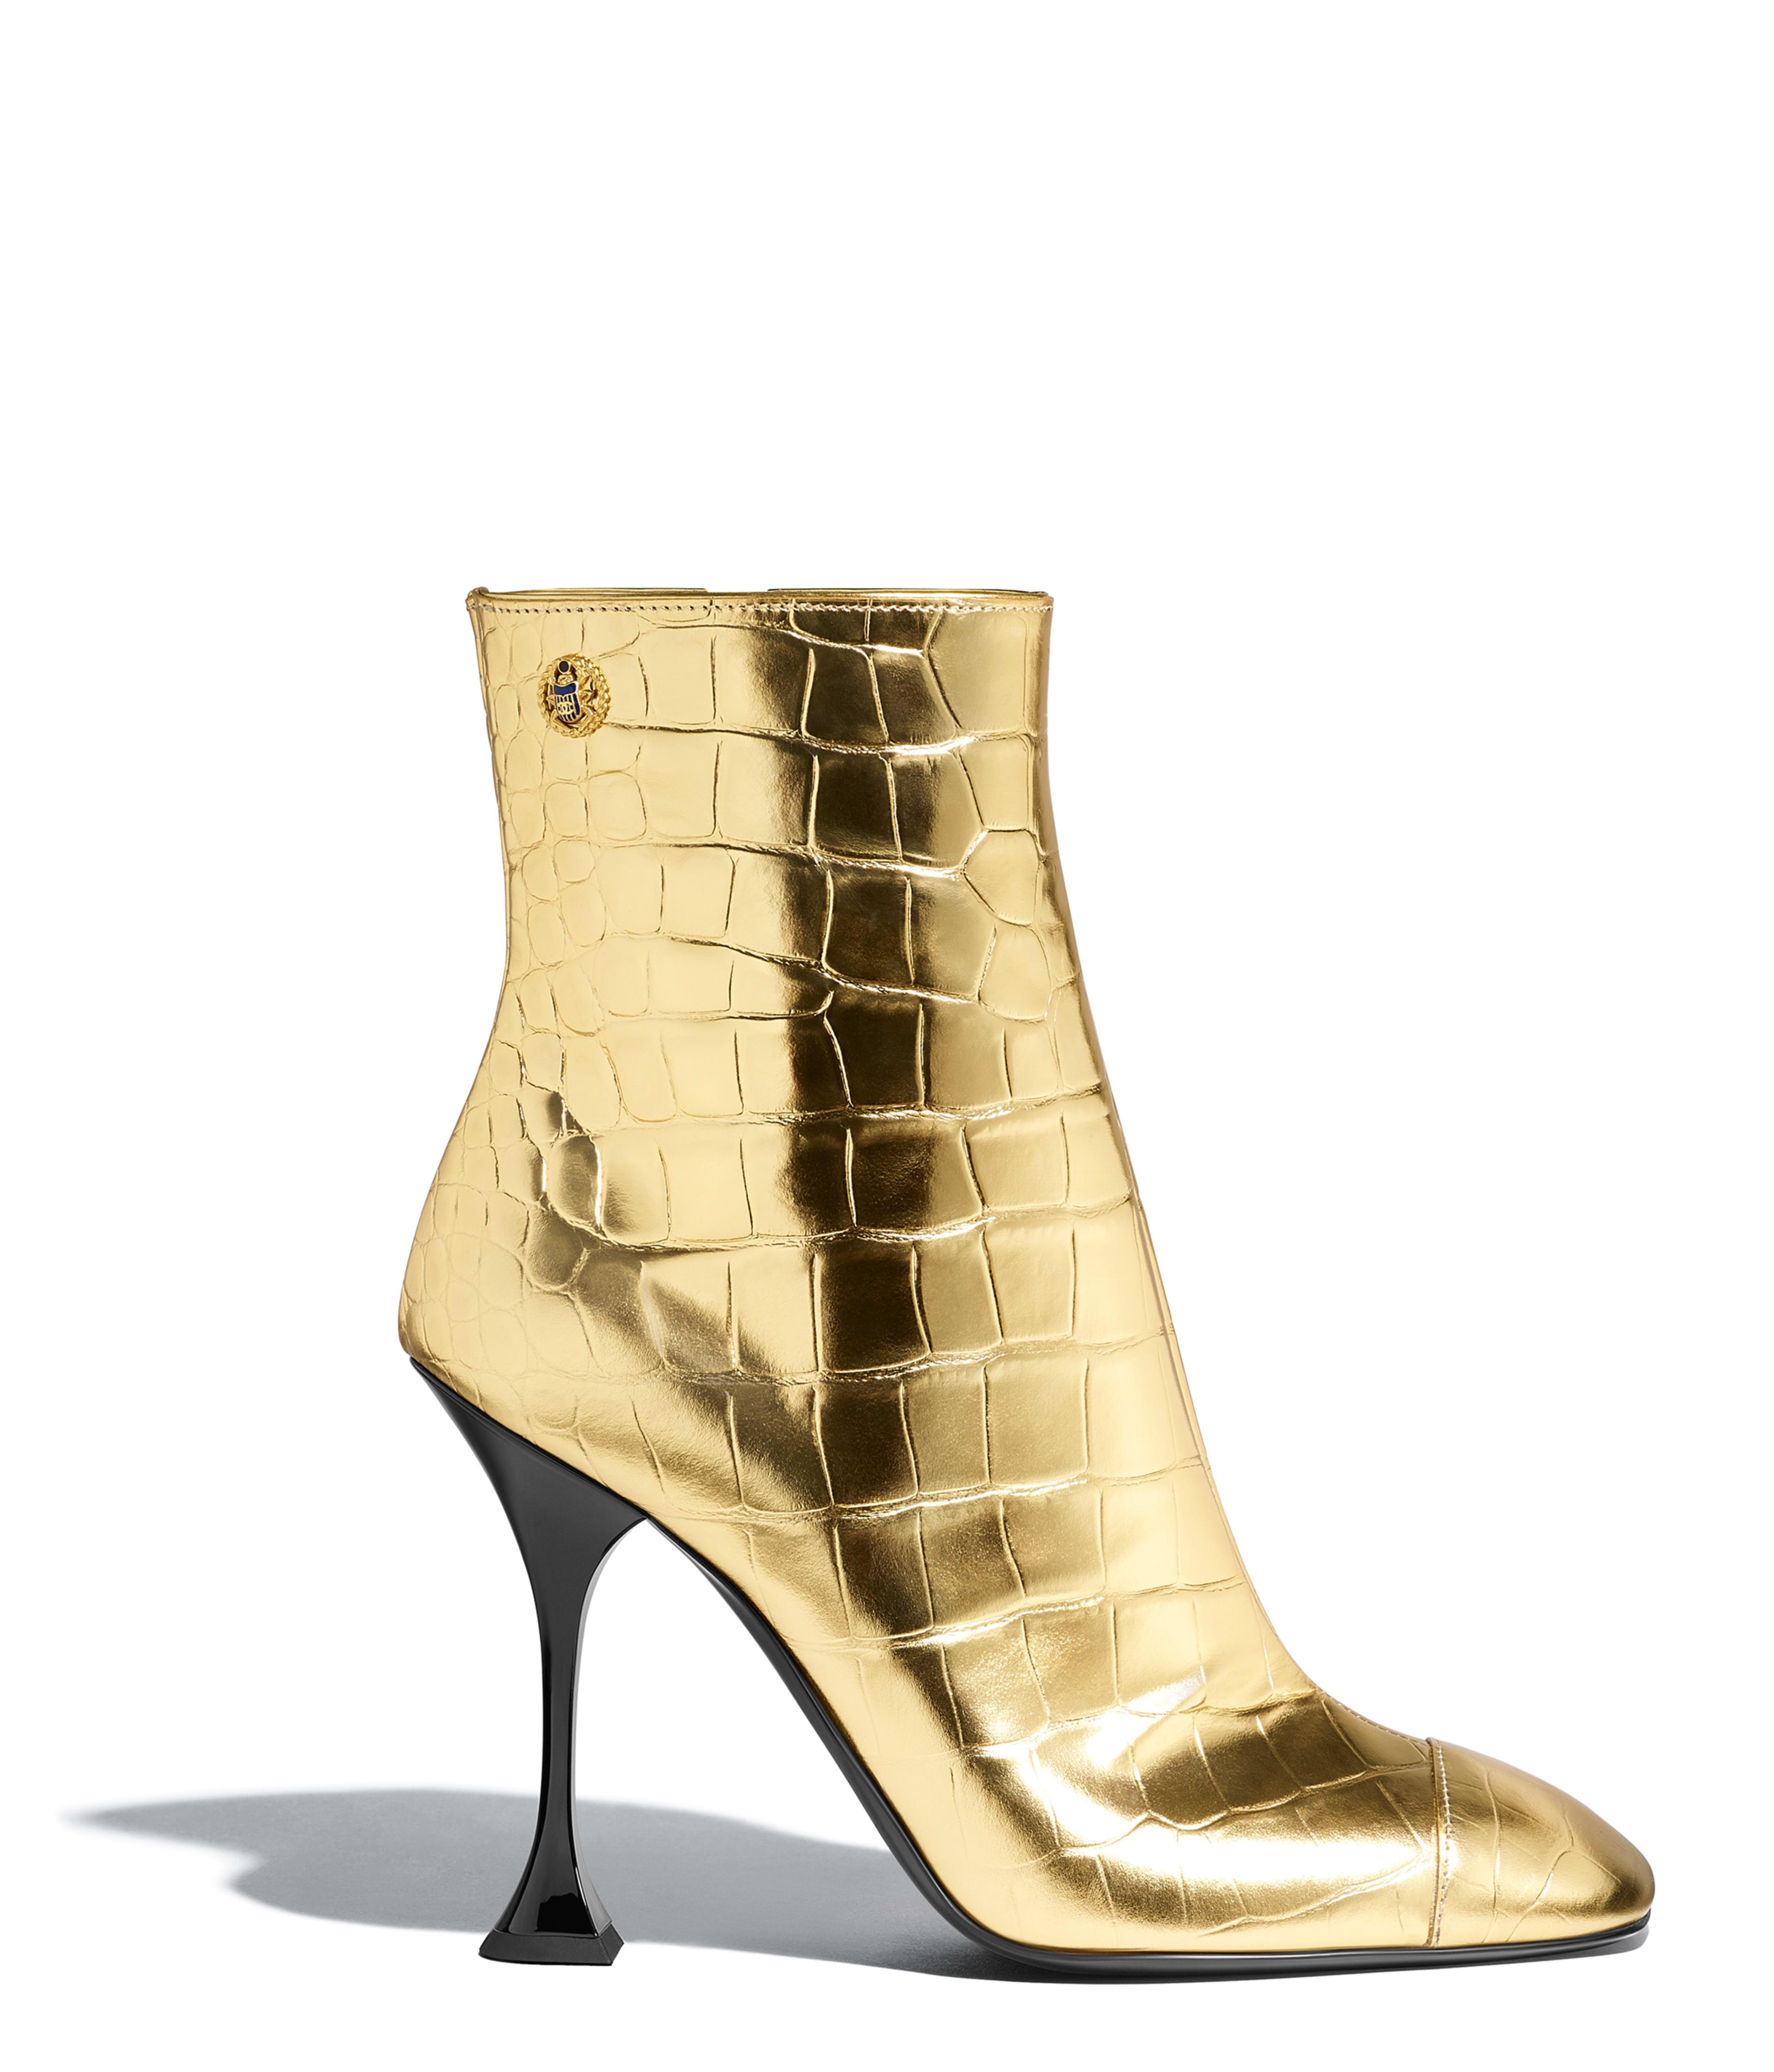 b6ccab8d601e Short Boots Crocodile Embossed Metallic Calfskin, Gold Ref.  G34902X530300H813